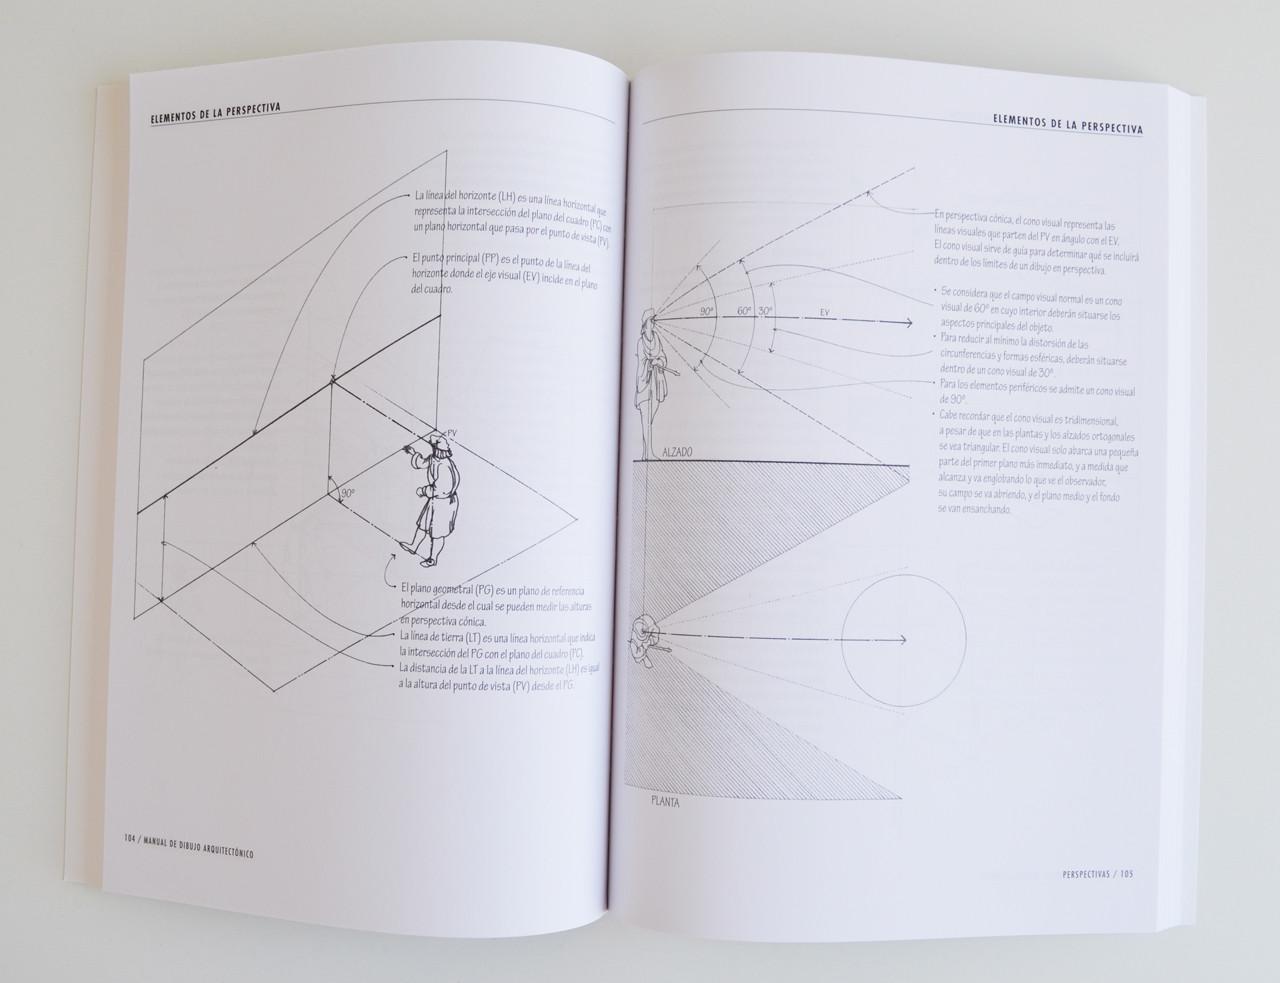 Dise o de interiores un manual francis ching pdf for Diseno de interiores pdf